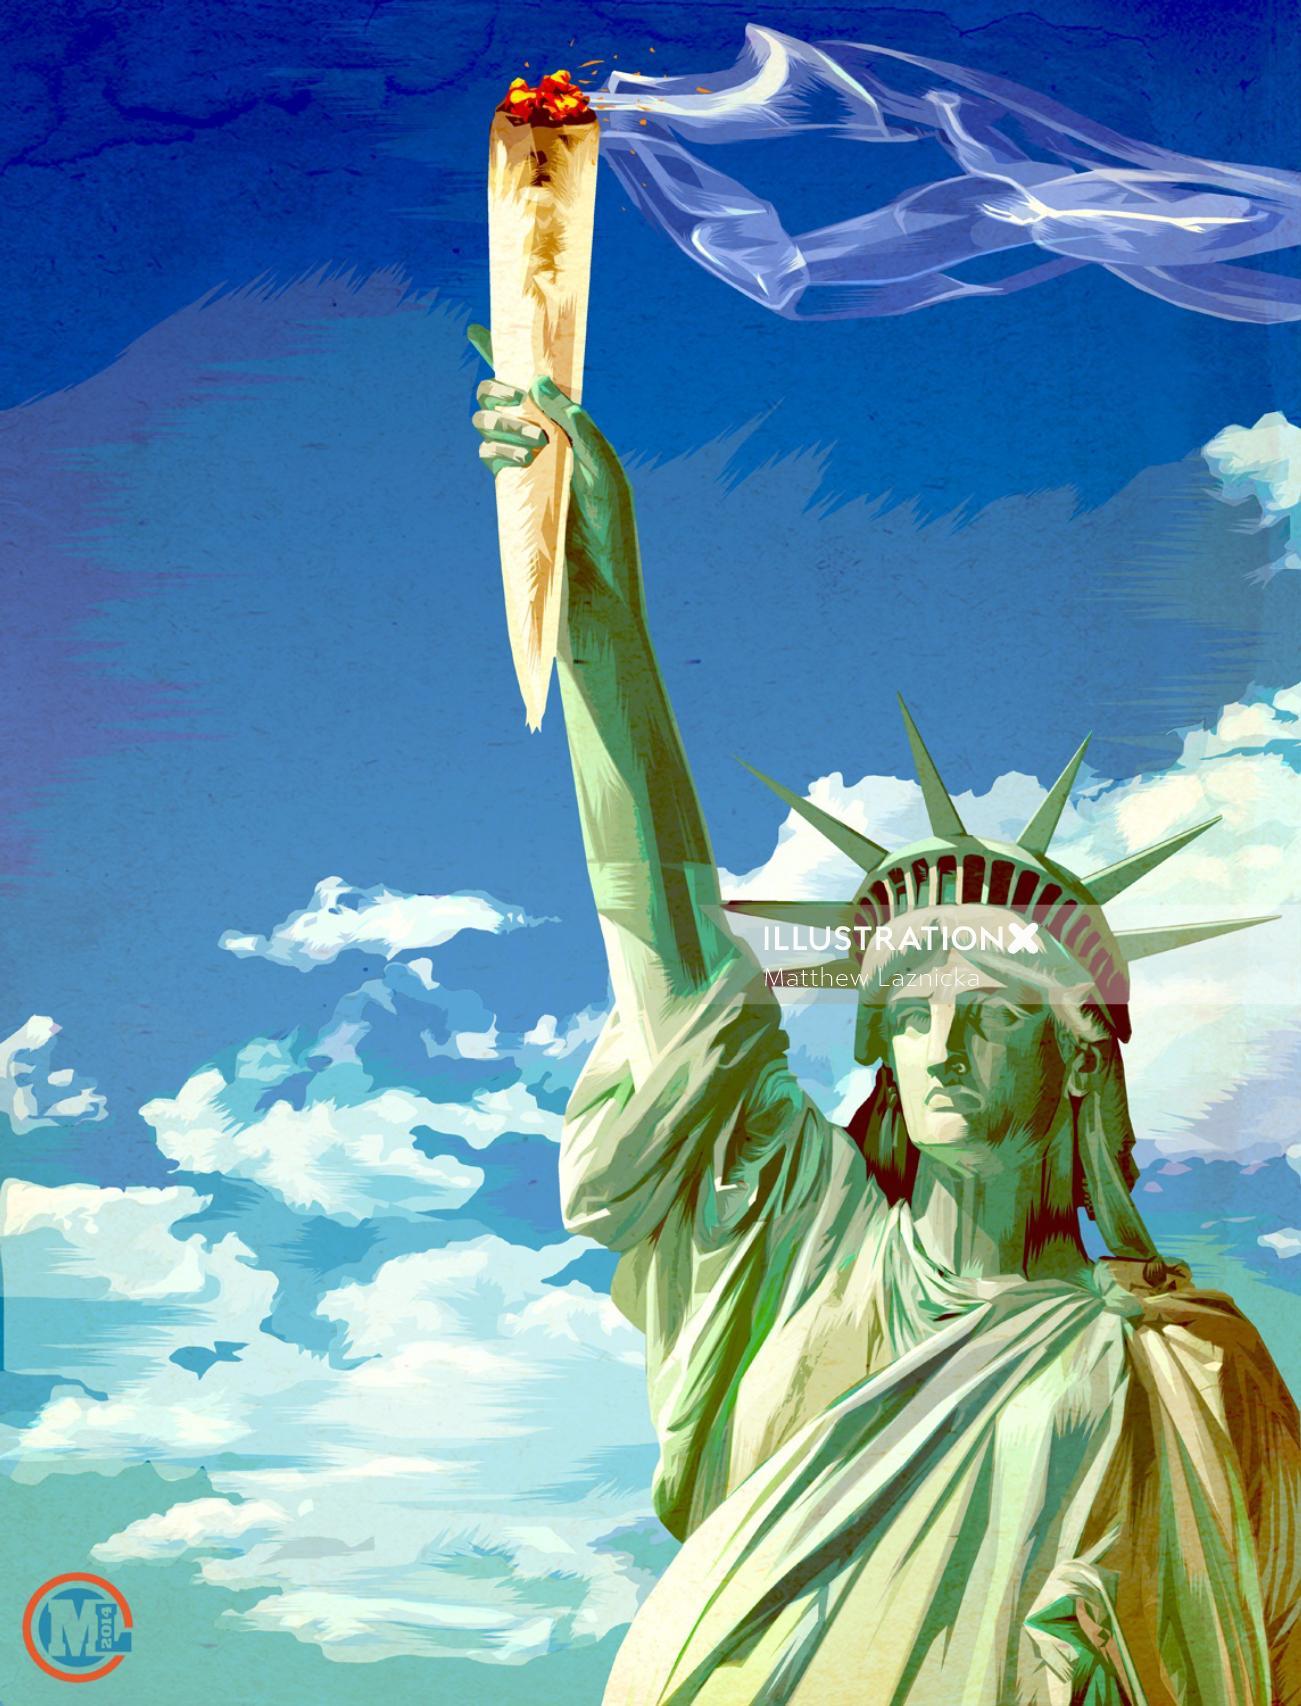 Illustration of statue of liberty